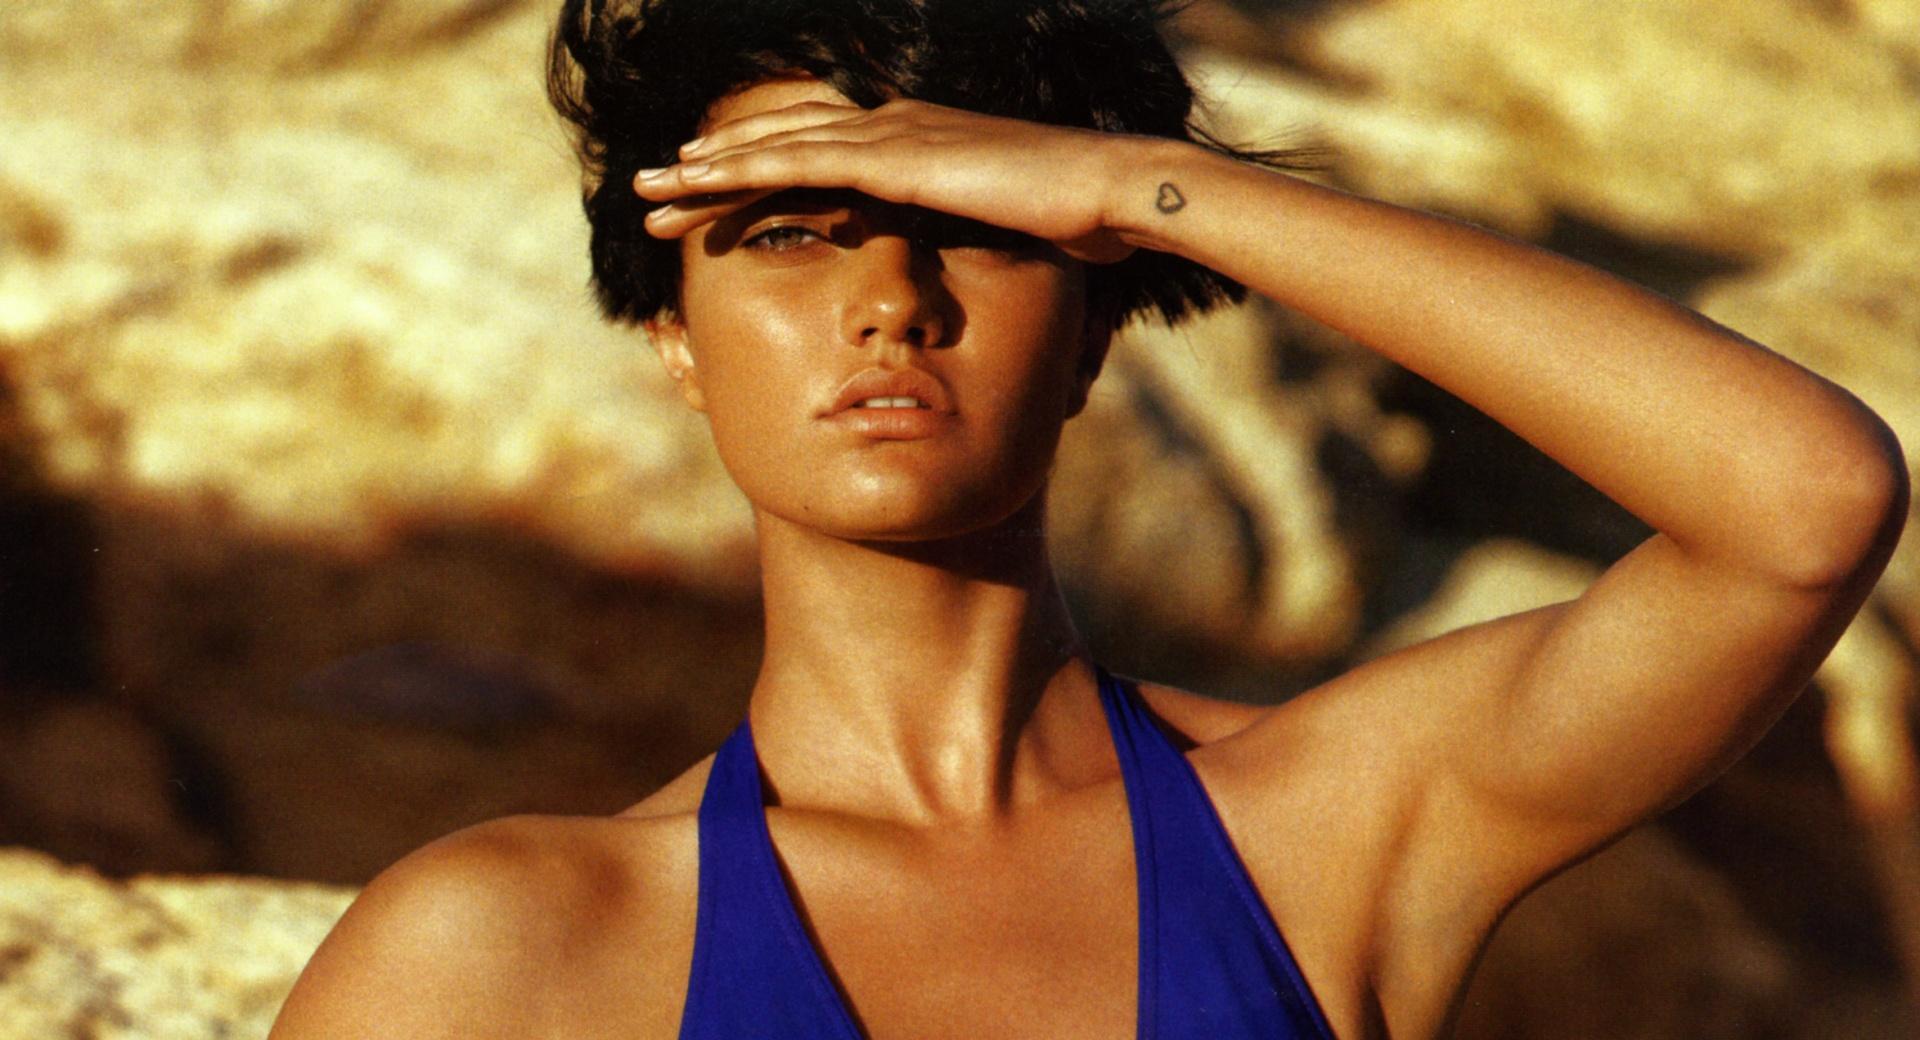 Victorias Secret Model wallpapers HD quality